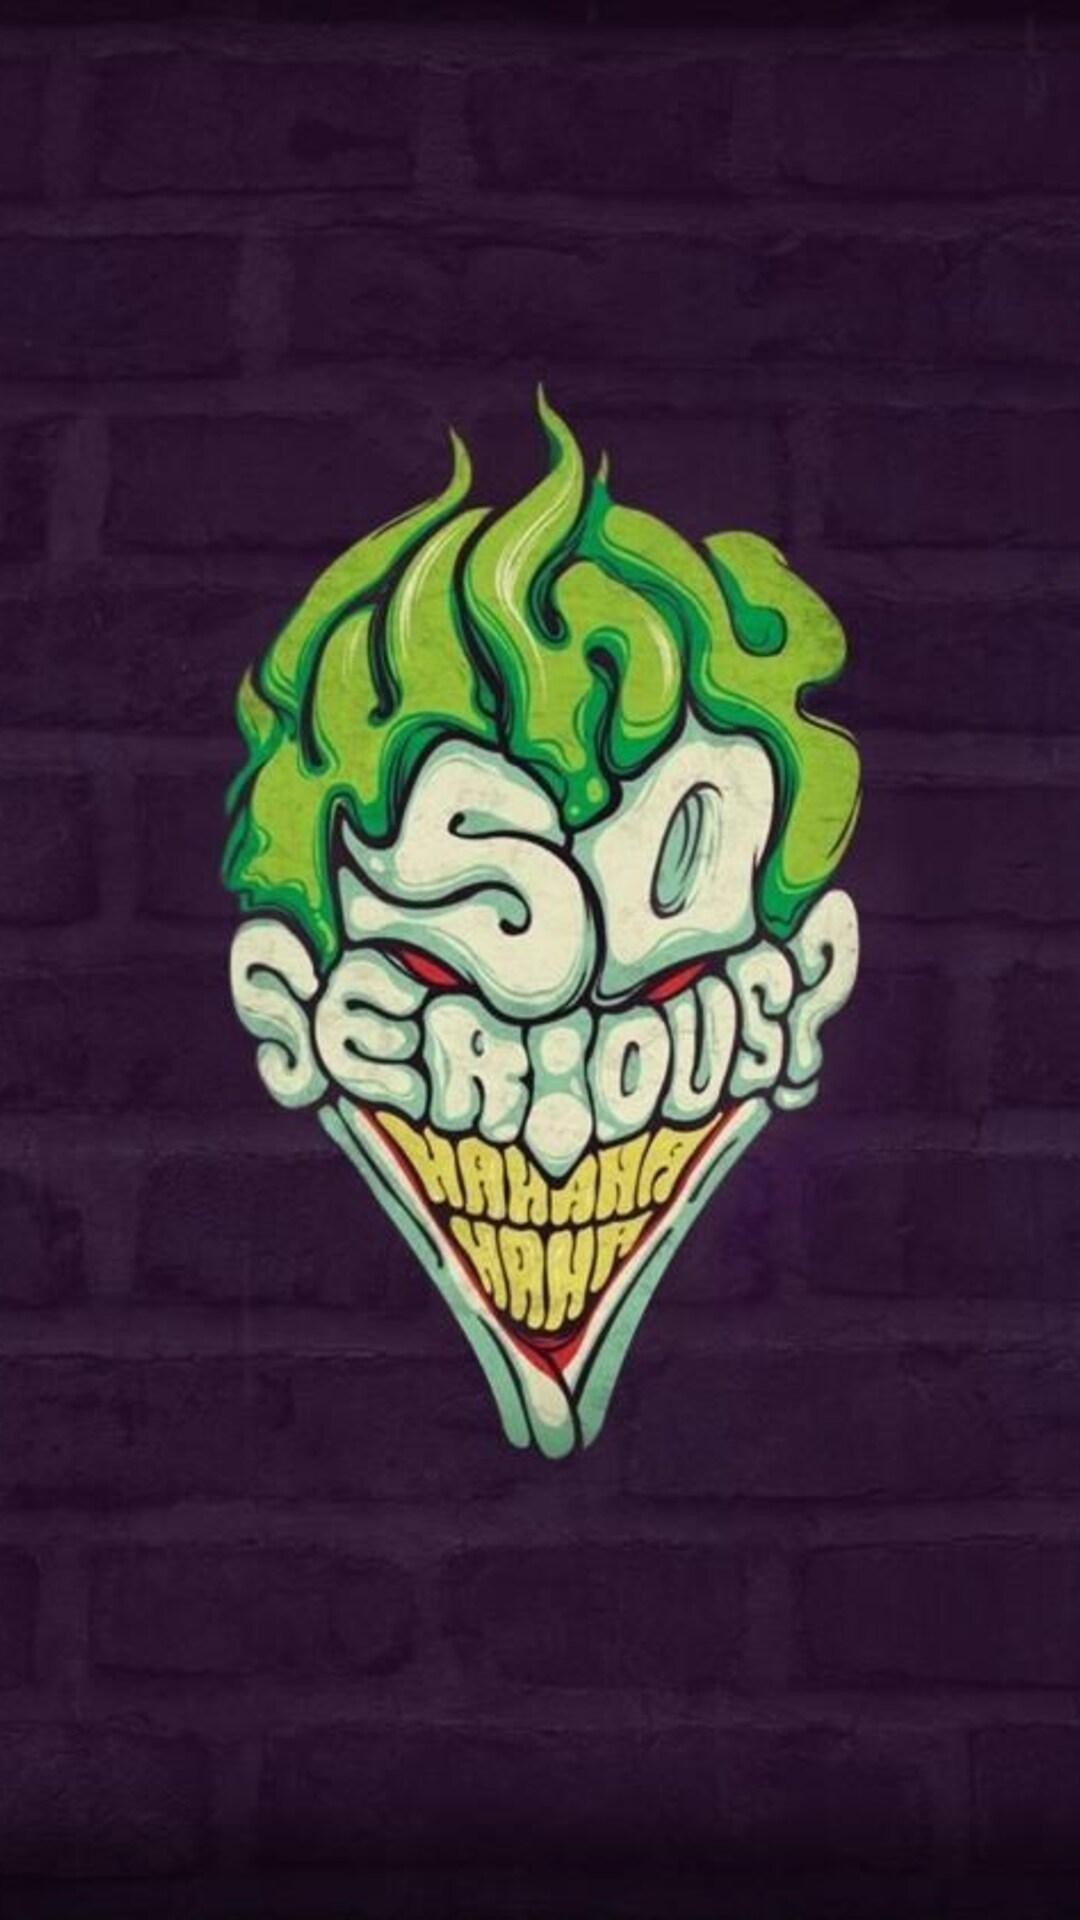 So Serious Joker Wallpaper